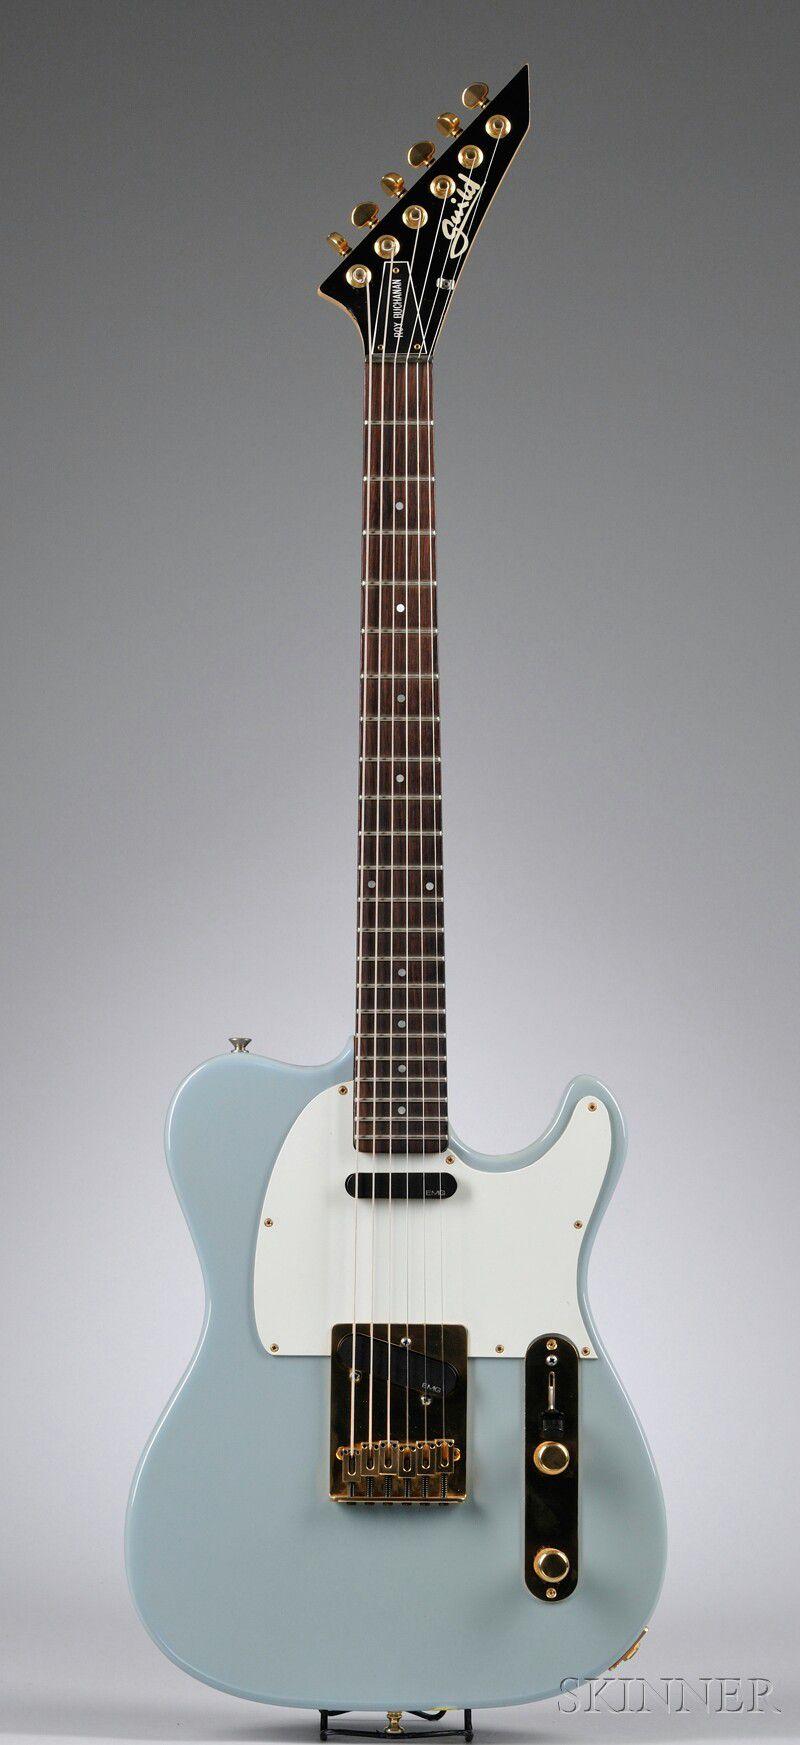 american electric guitar guild guitars westerly 1986 prototype roy buchanan signature model. Black Bedroom Furniture Sets. Home Design Ideas